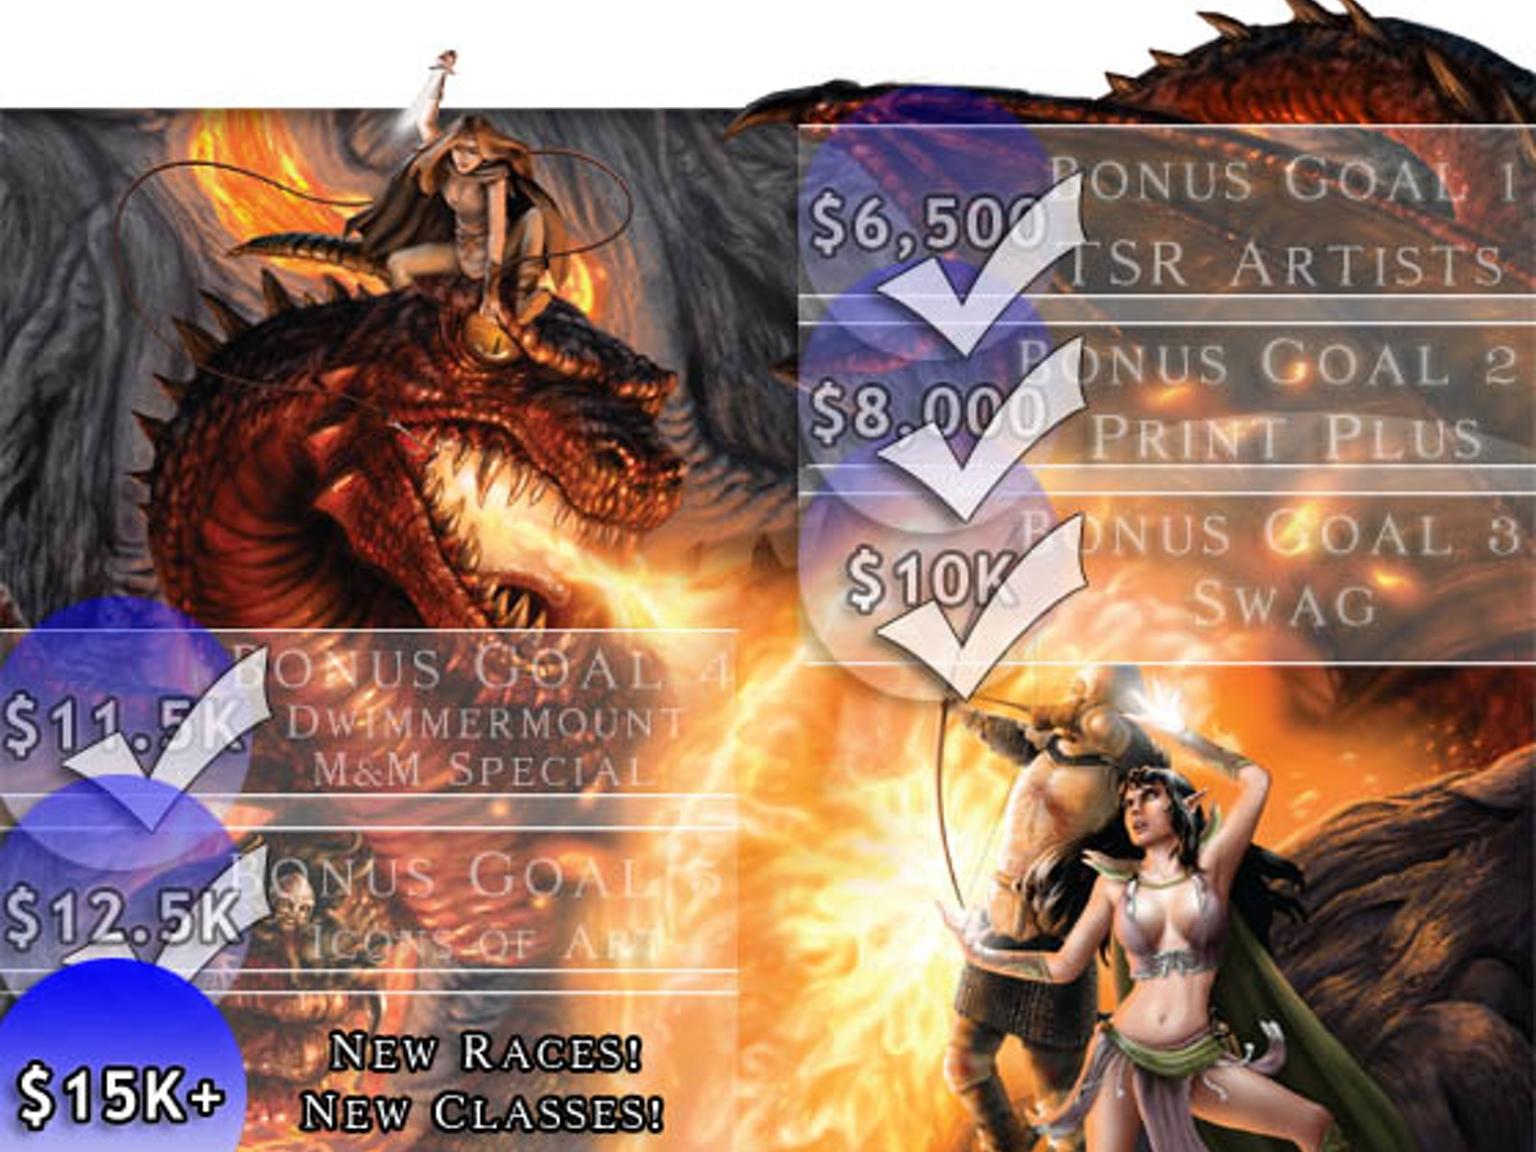 Tenkar 39 s tavern kickstarter myth magic player 39 s guide for Bureau 13 rpg pdf